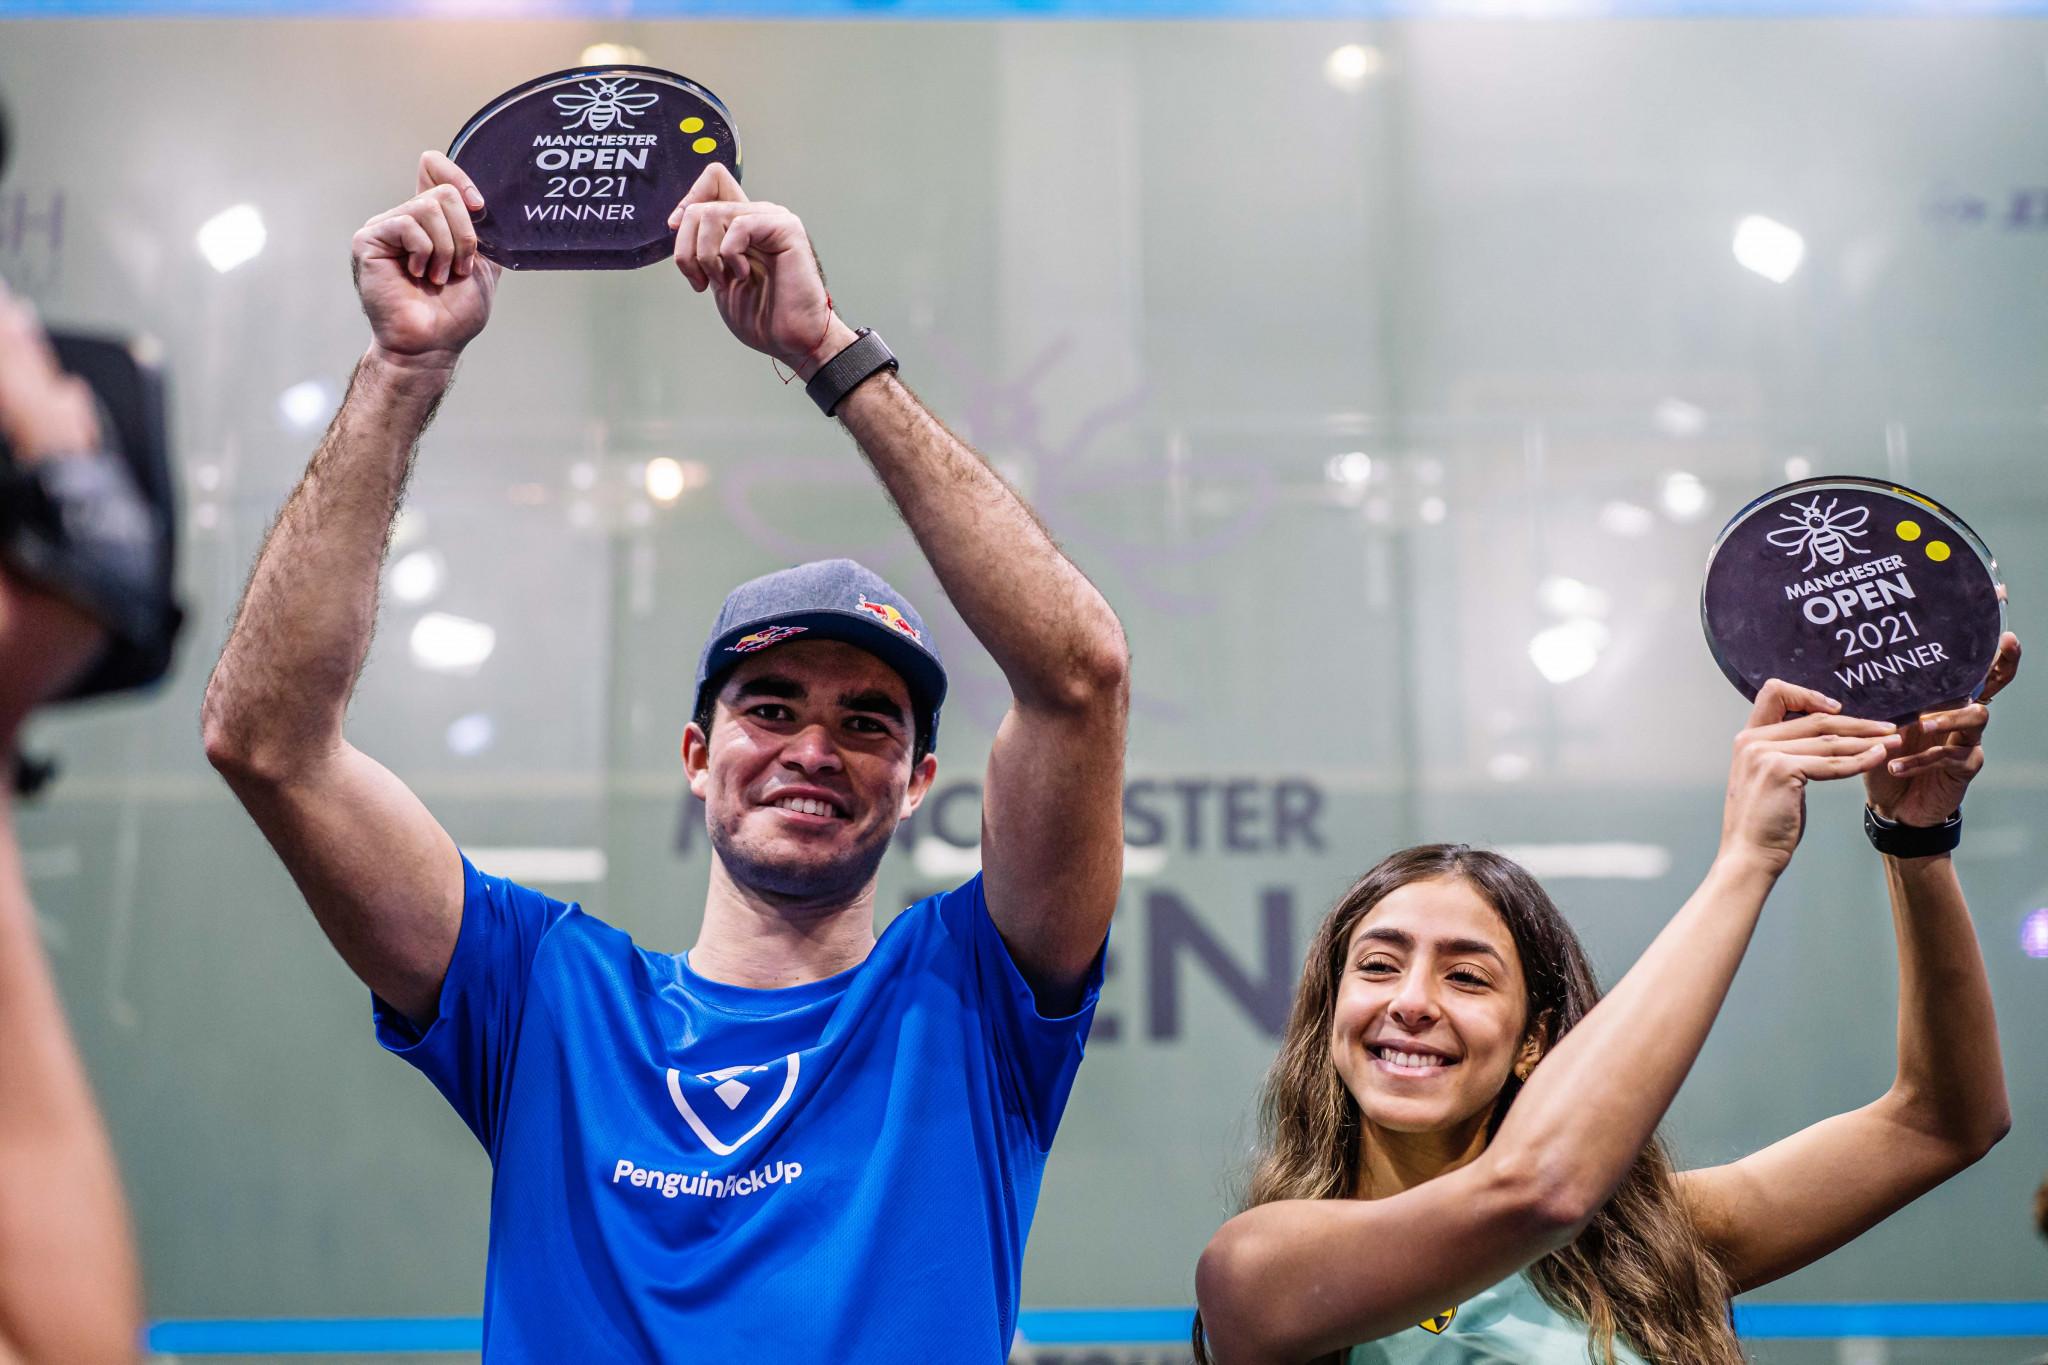 El Hammamy and Elías triumph at Manchester Open